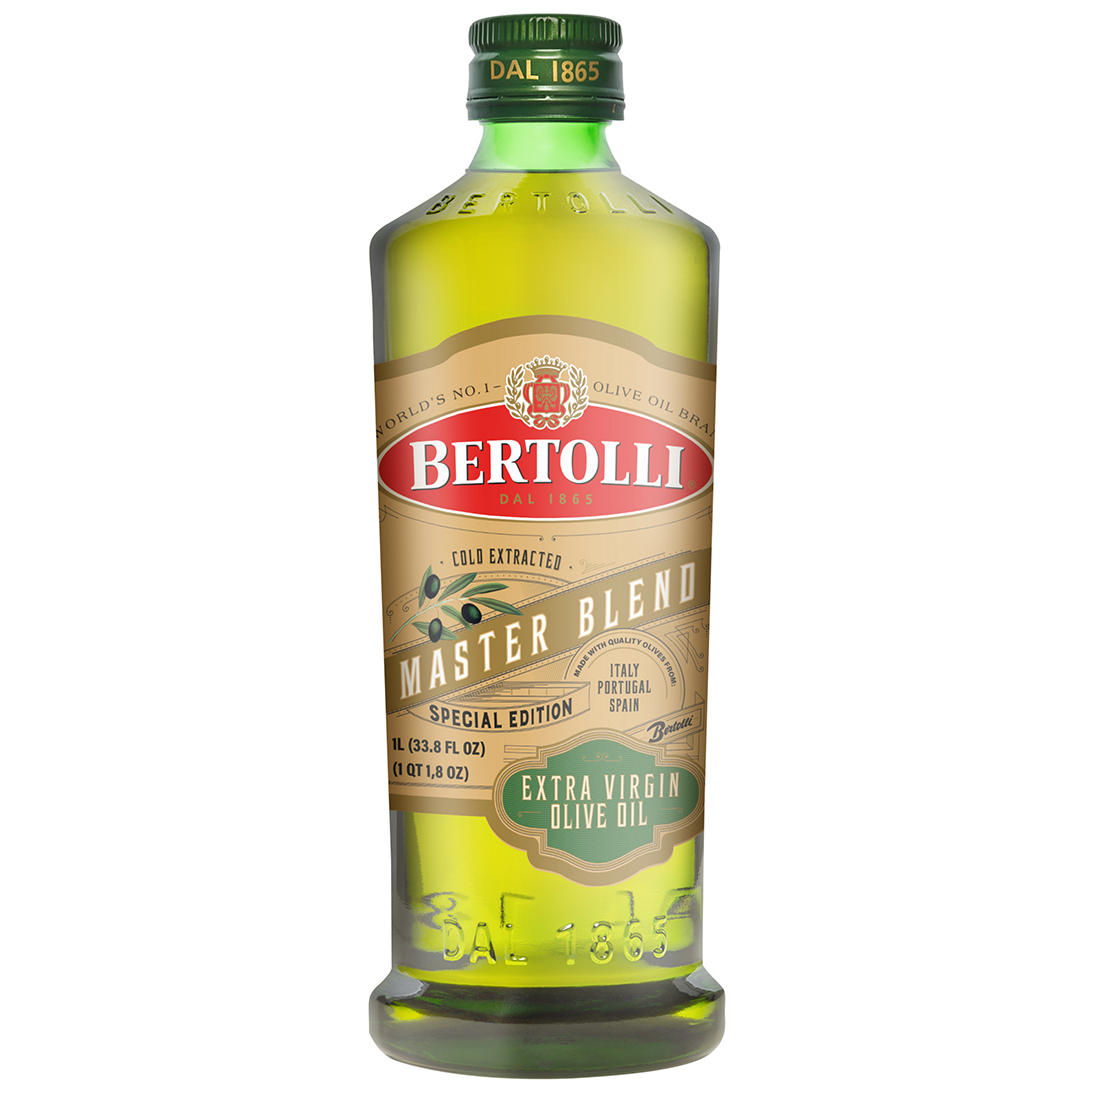 Bertolli Master Blend Extra Virgin Olive Oil, 1L